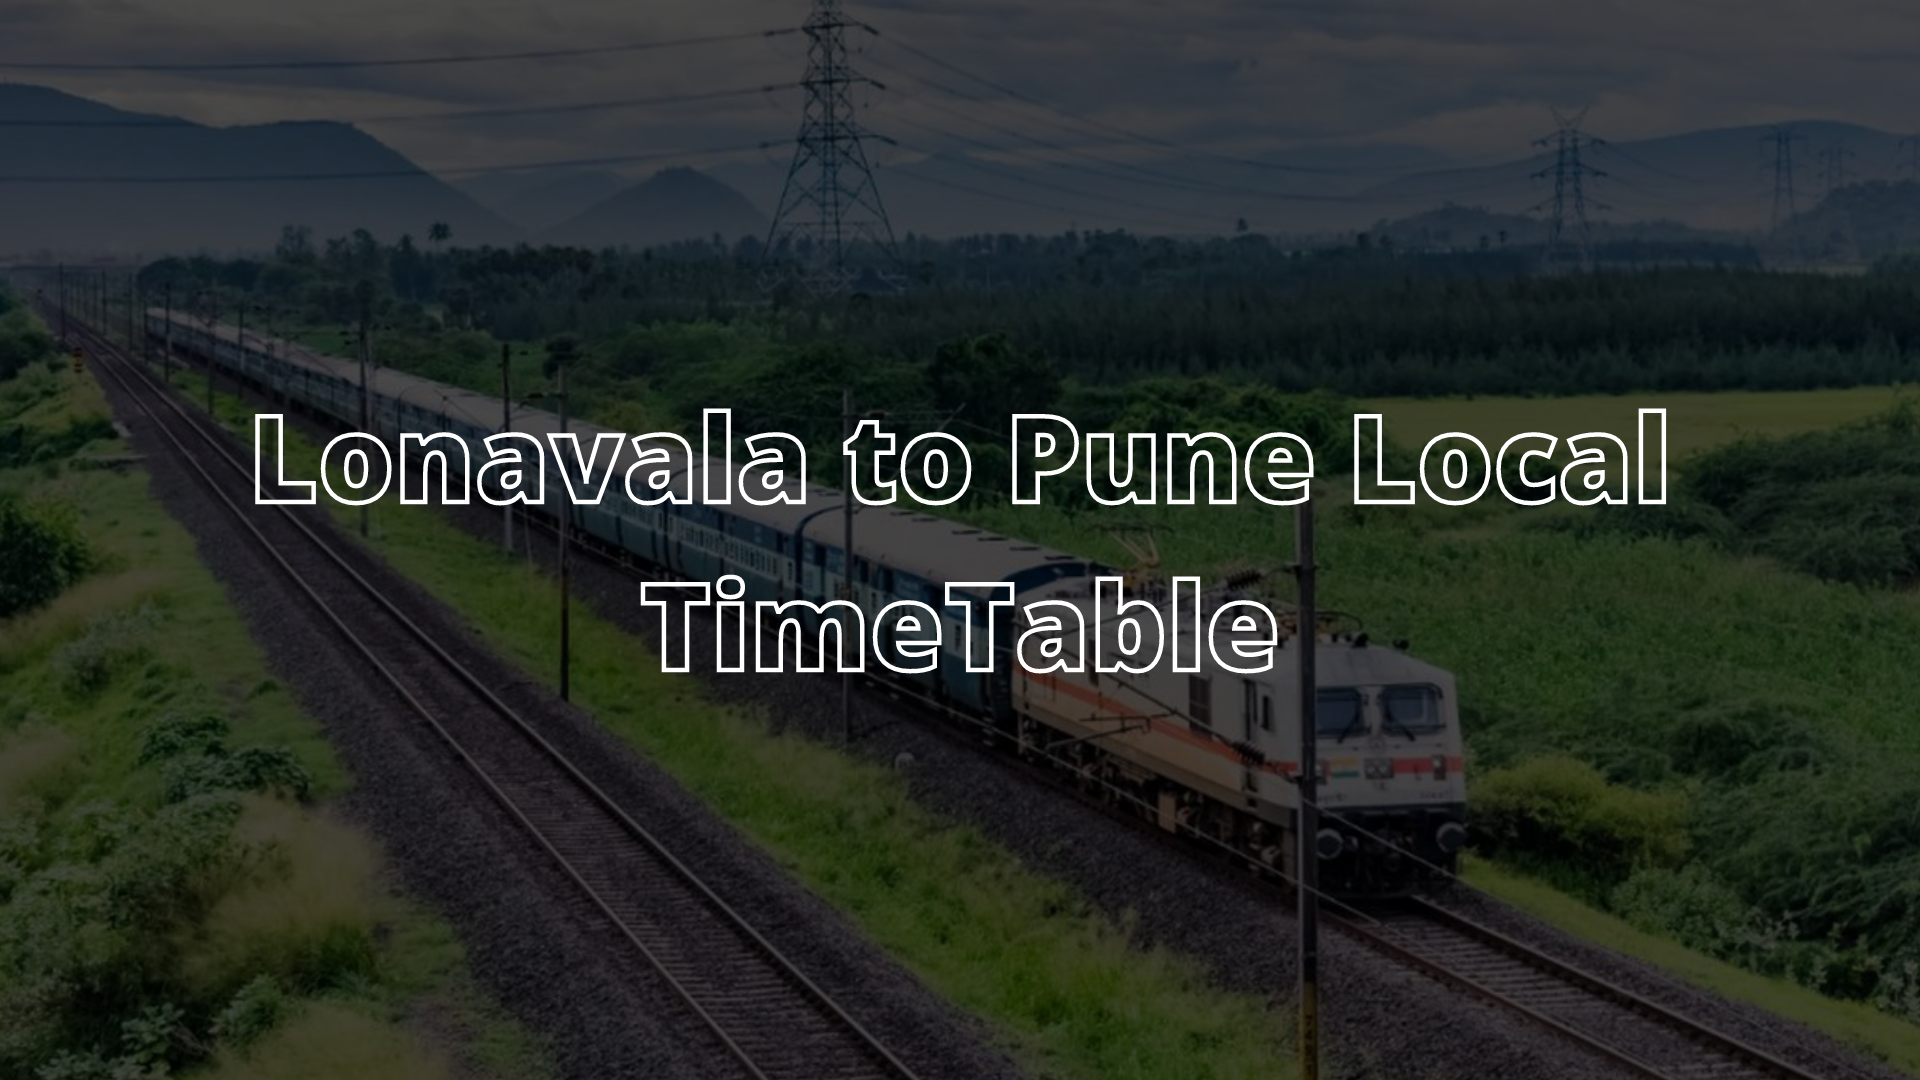 Lonavala to Pune Local TimeTable